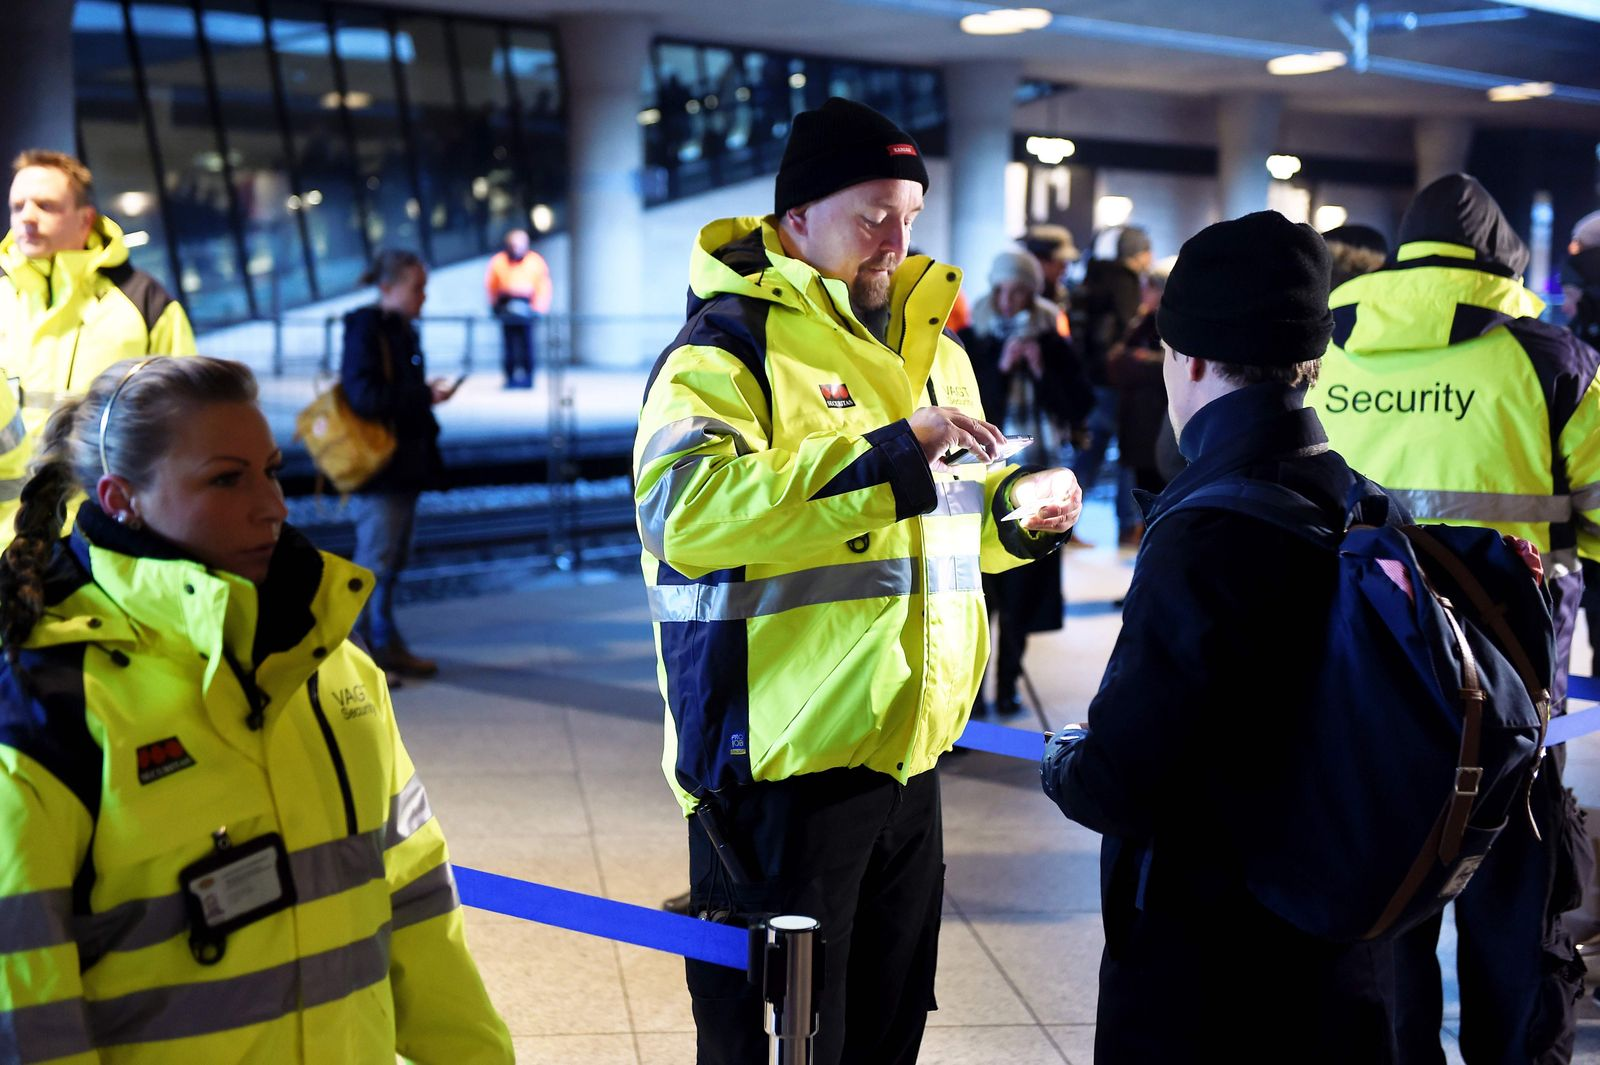 SWEDEN-TRAVEL-RESTRICTION-DENMARK-EUROPE-MIGRANTS